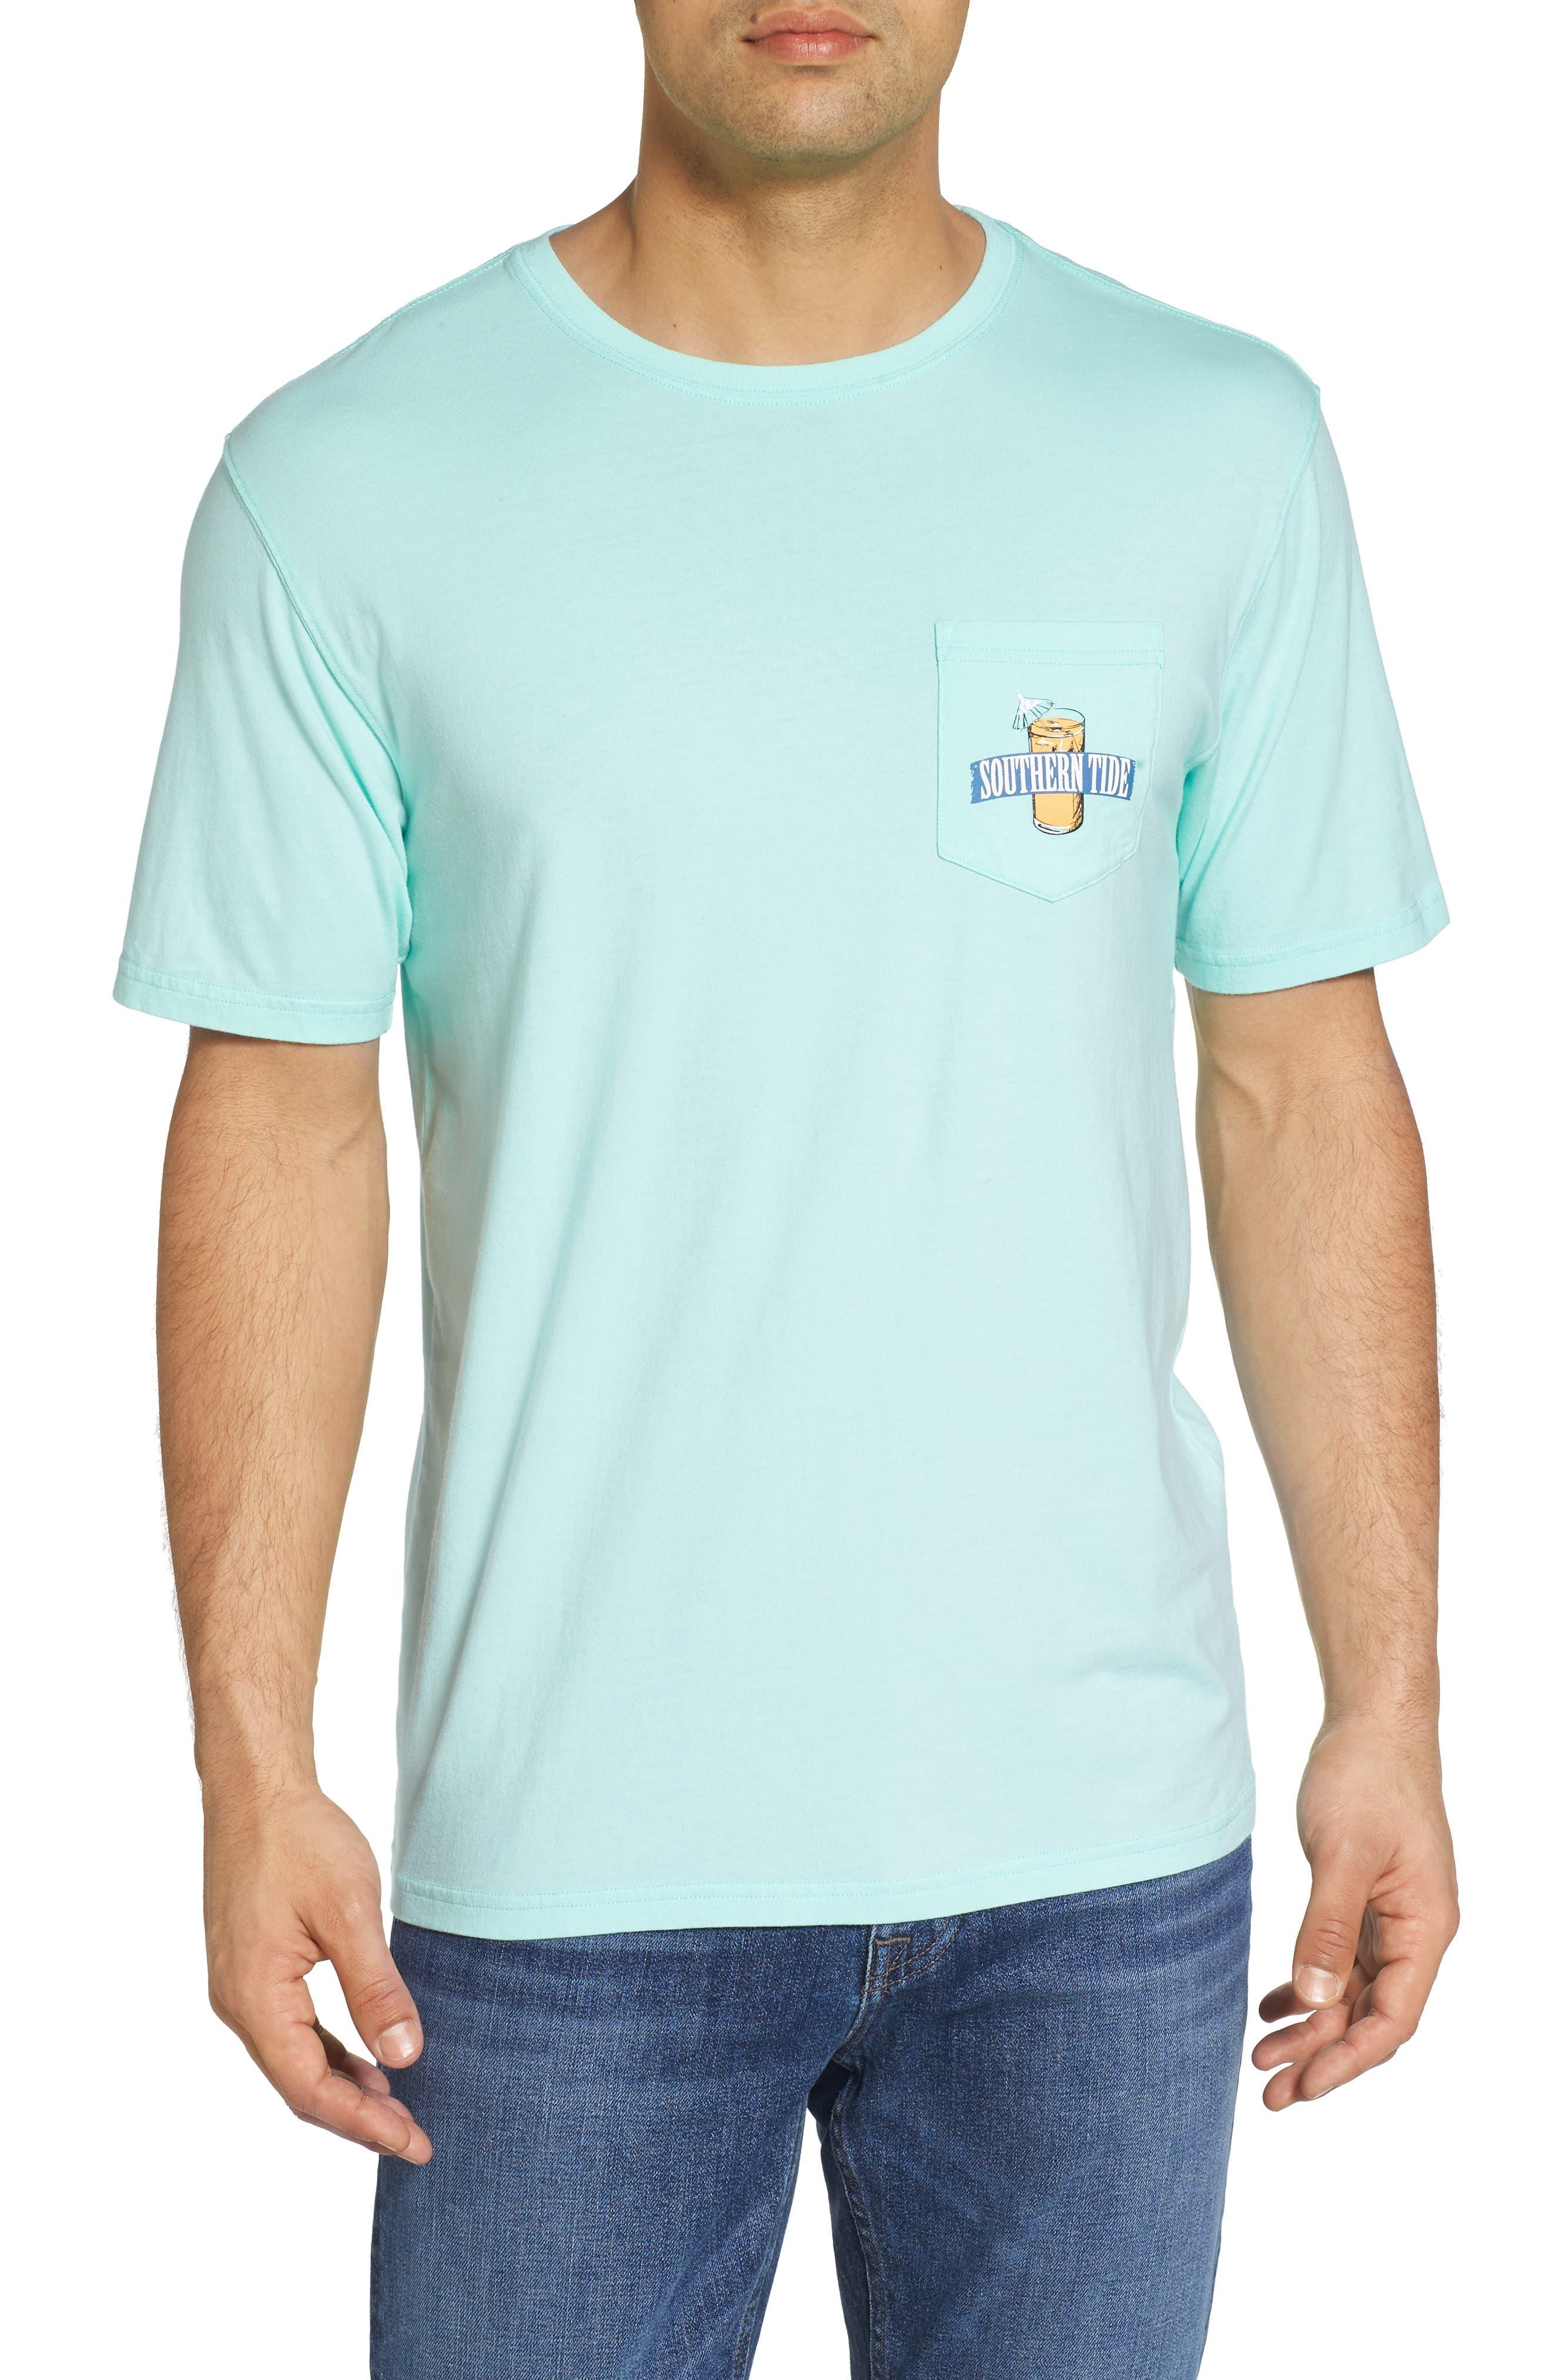 Southern Tide Southern Mix Crewneck T-Shirt